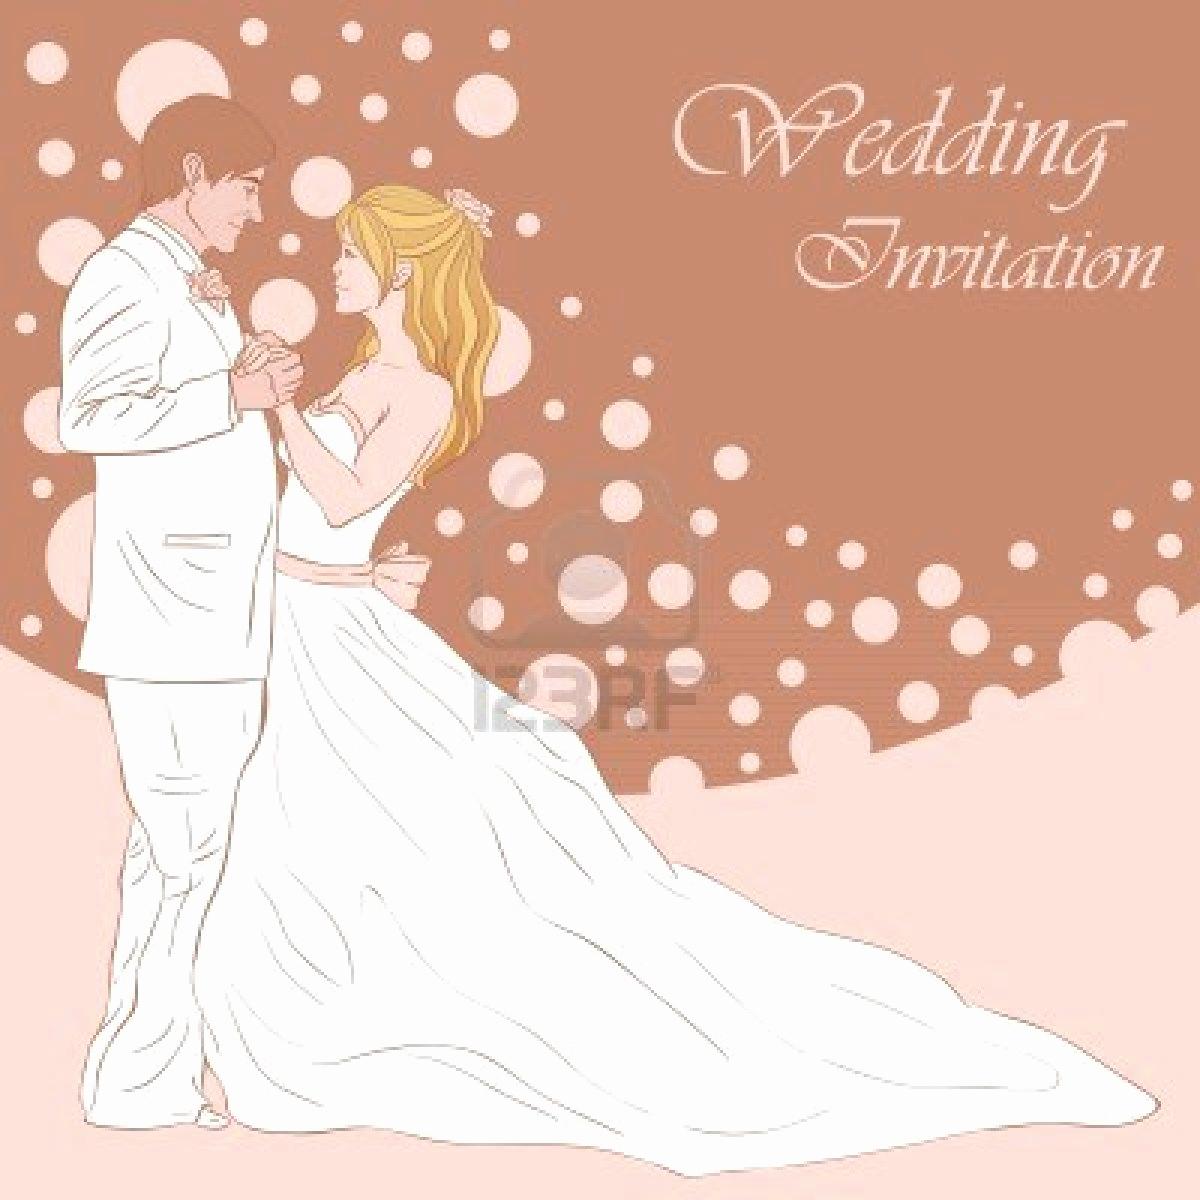 Wedding Invitation Background Designs Beautiful Wedding Invitation Background Designs – Weneedfun